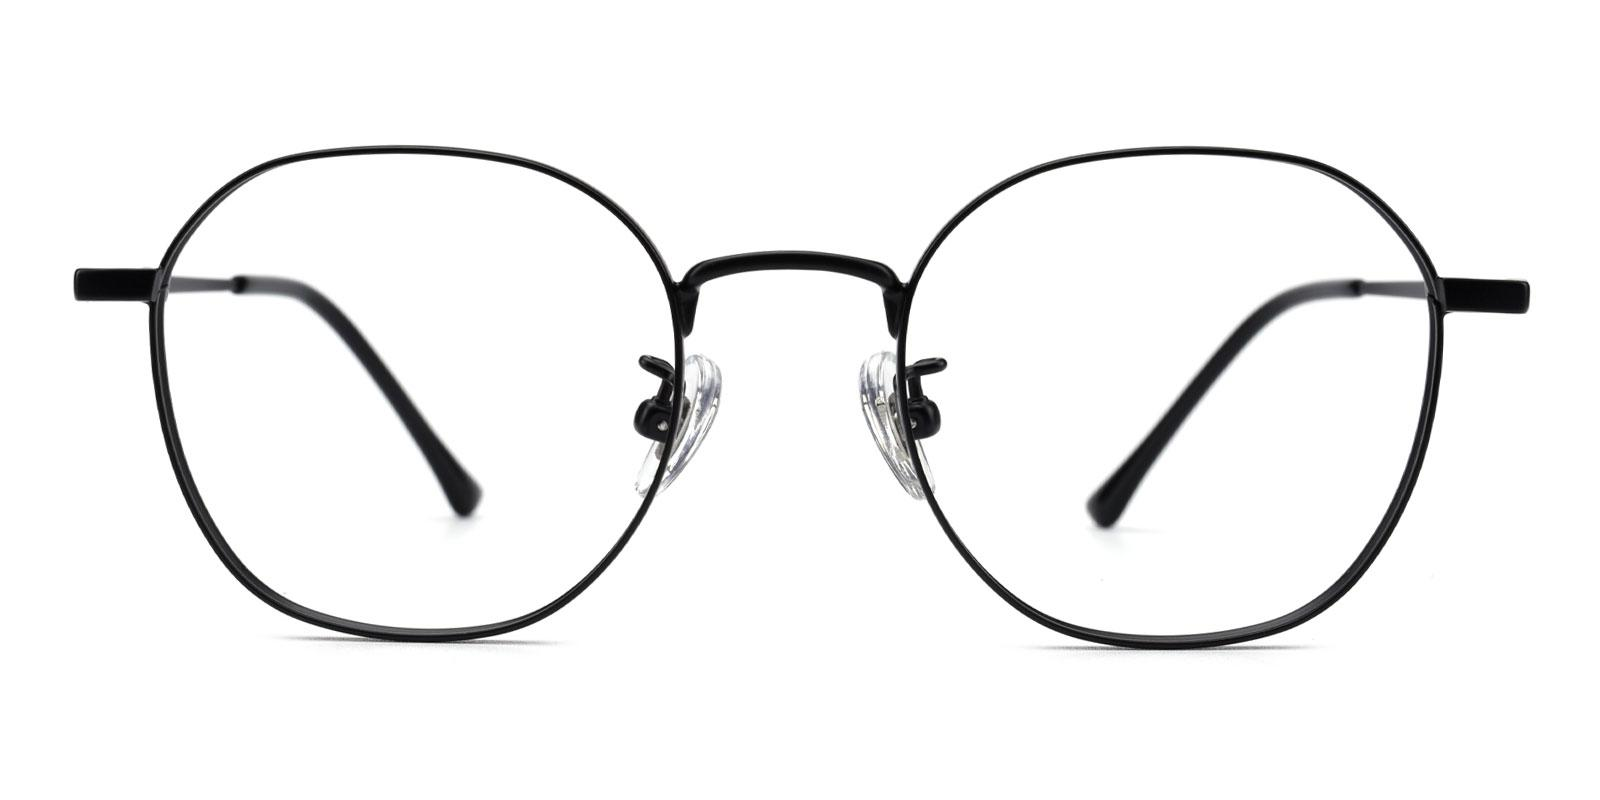 Iron-Black-Round-Titanium-Eyeglasses-additional2